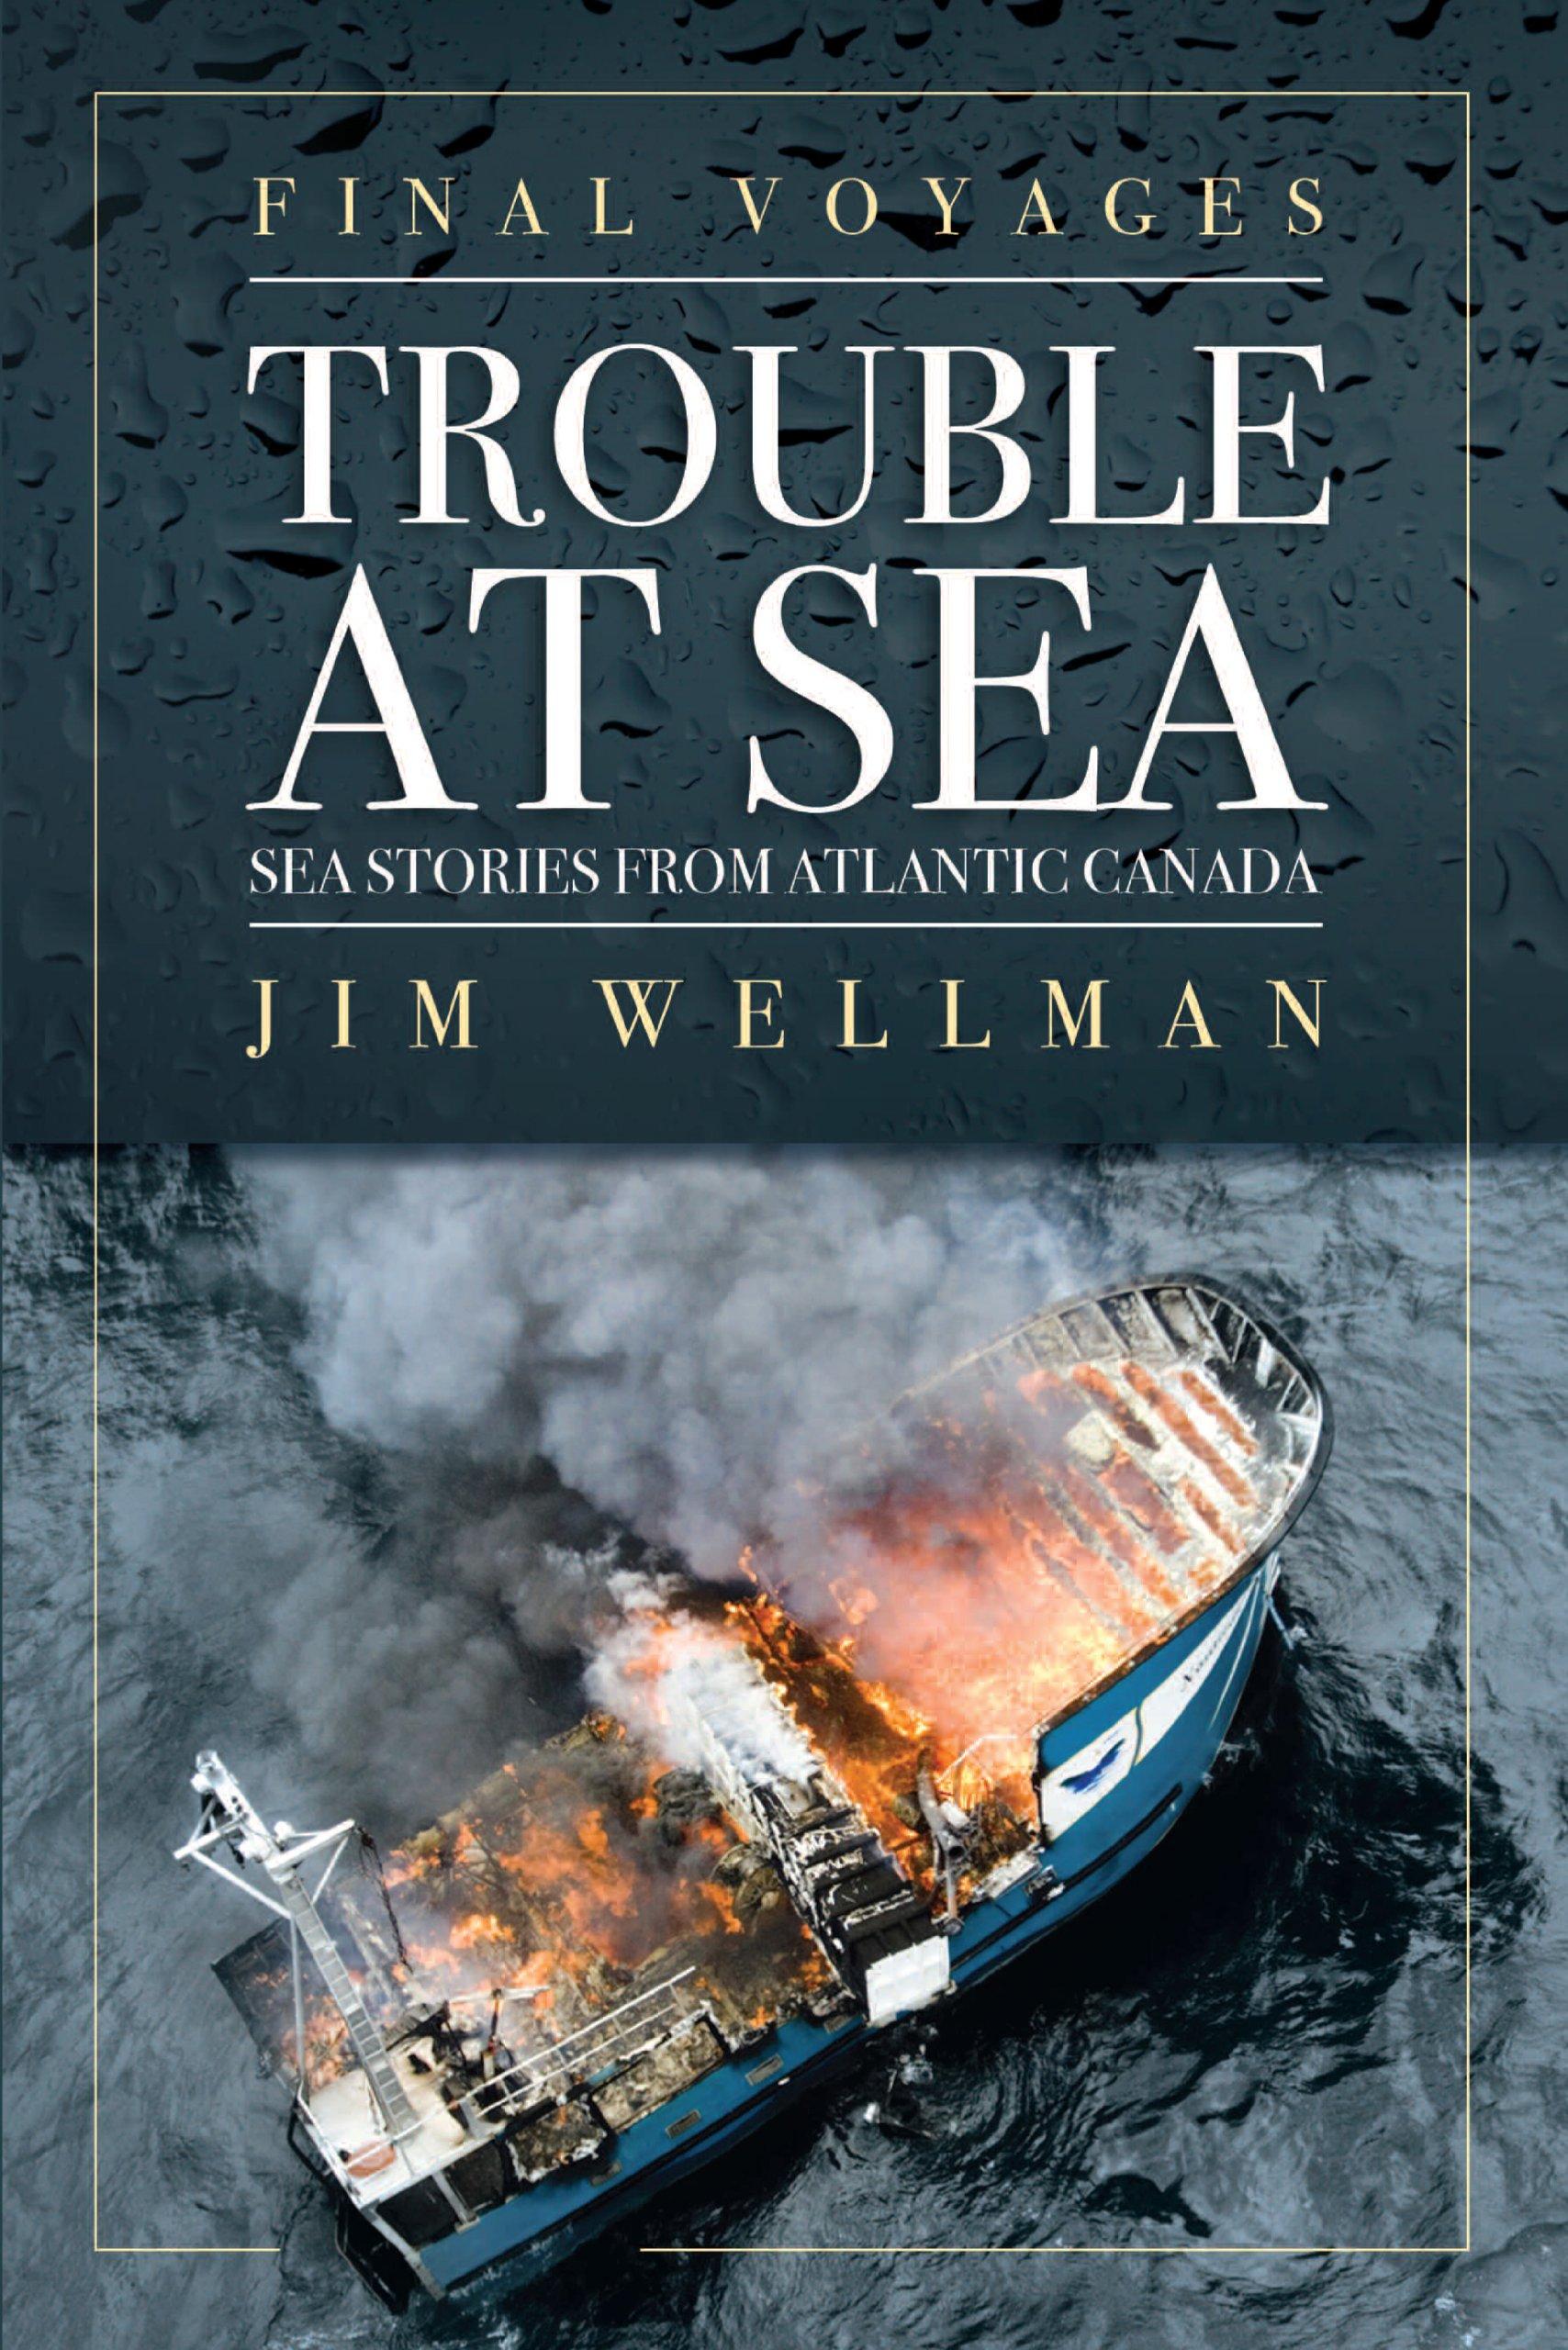 Final Voyages: Trouble at Sea pdf epub